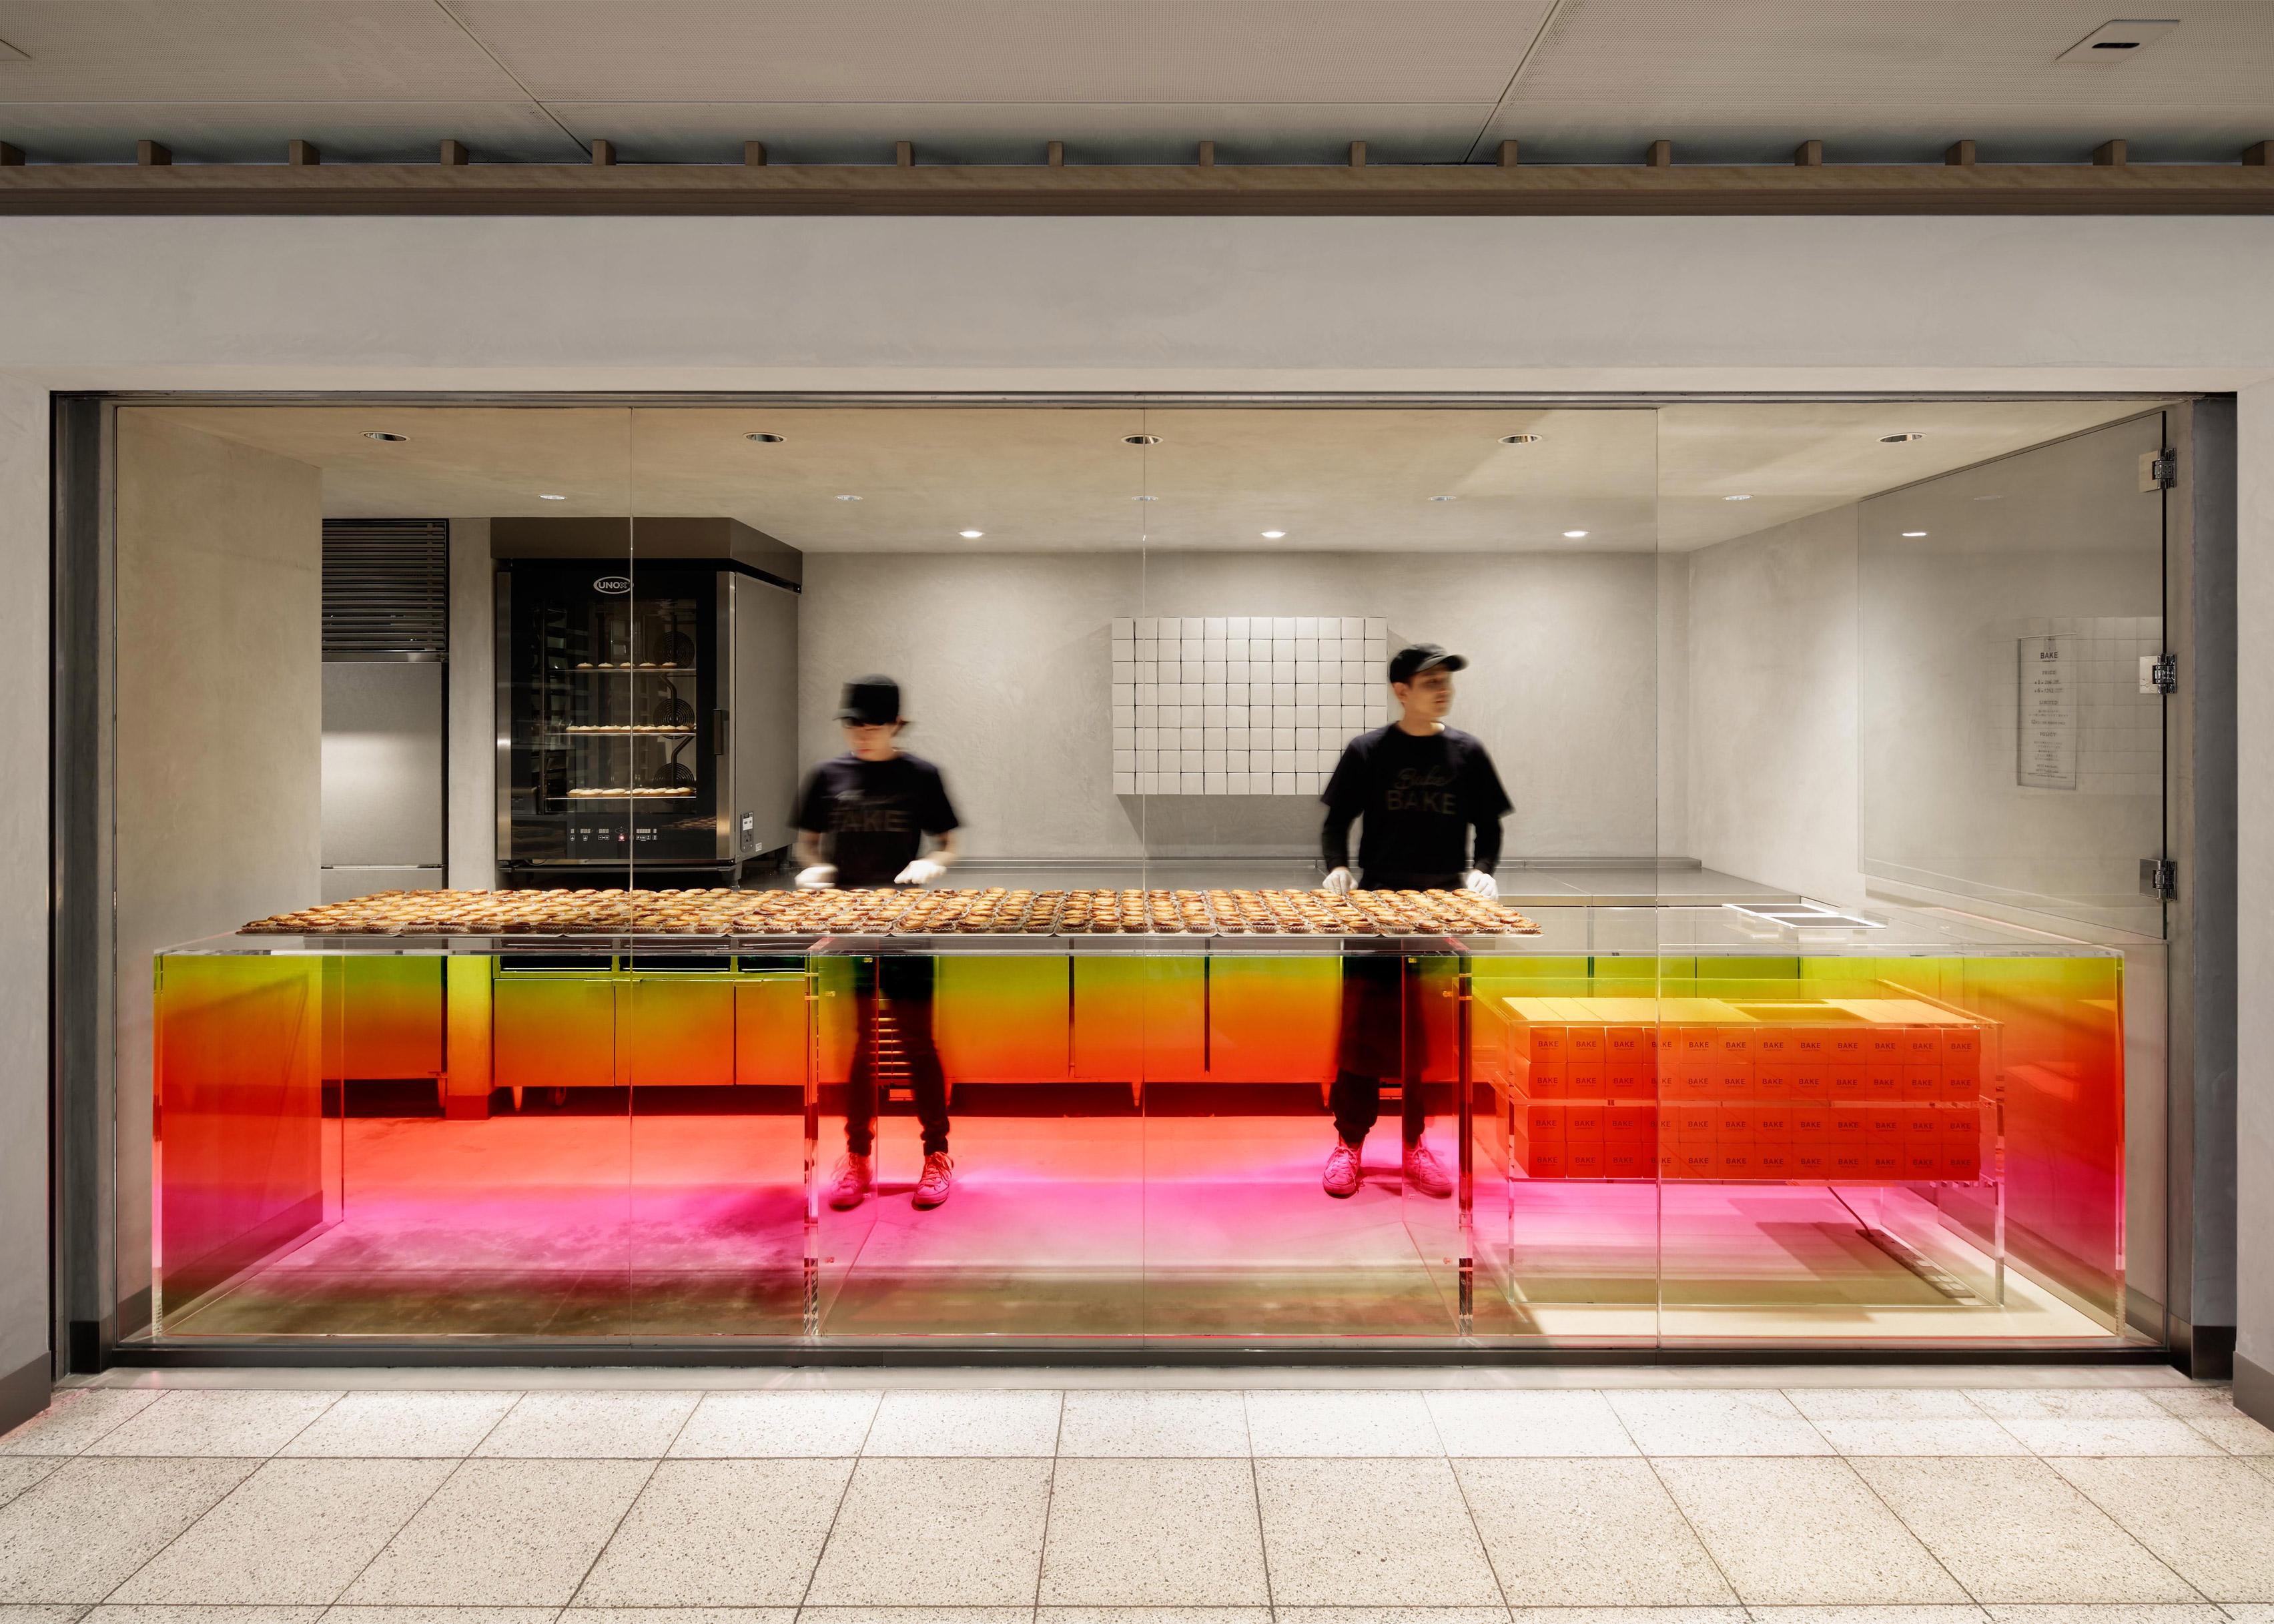 Sunset-hued counter welcomes customers at Tokyo cheese tart shop